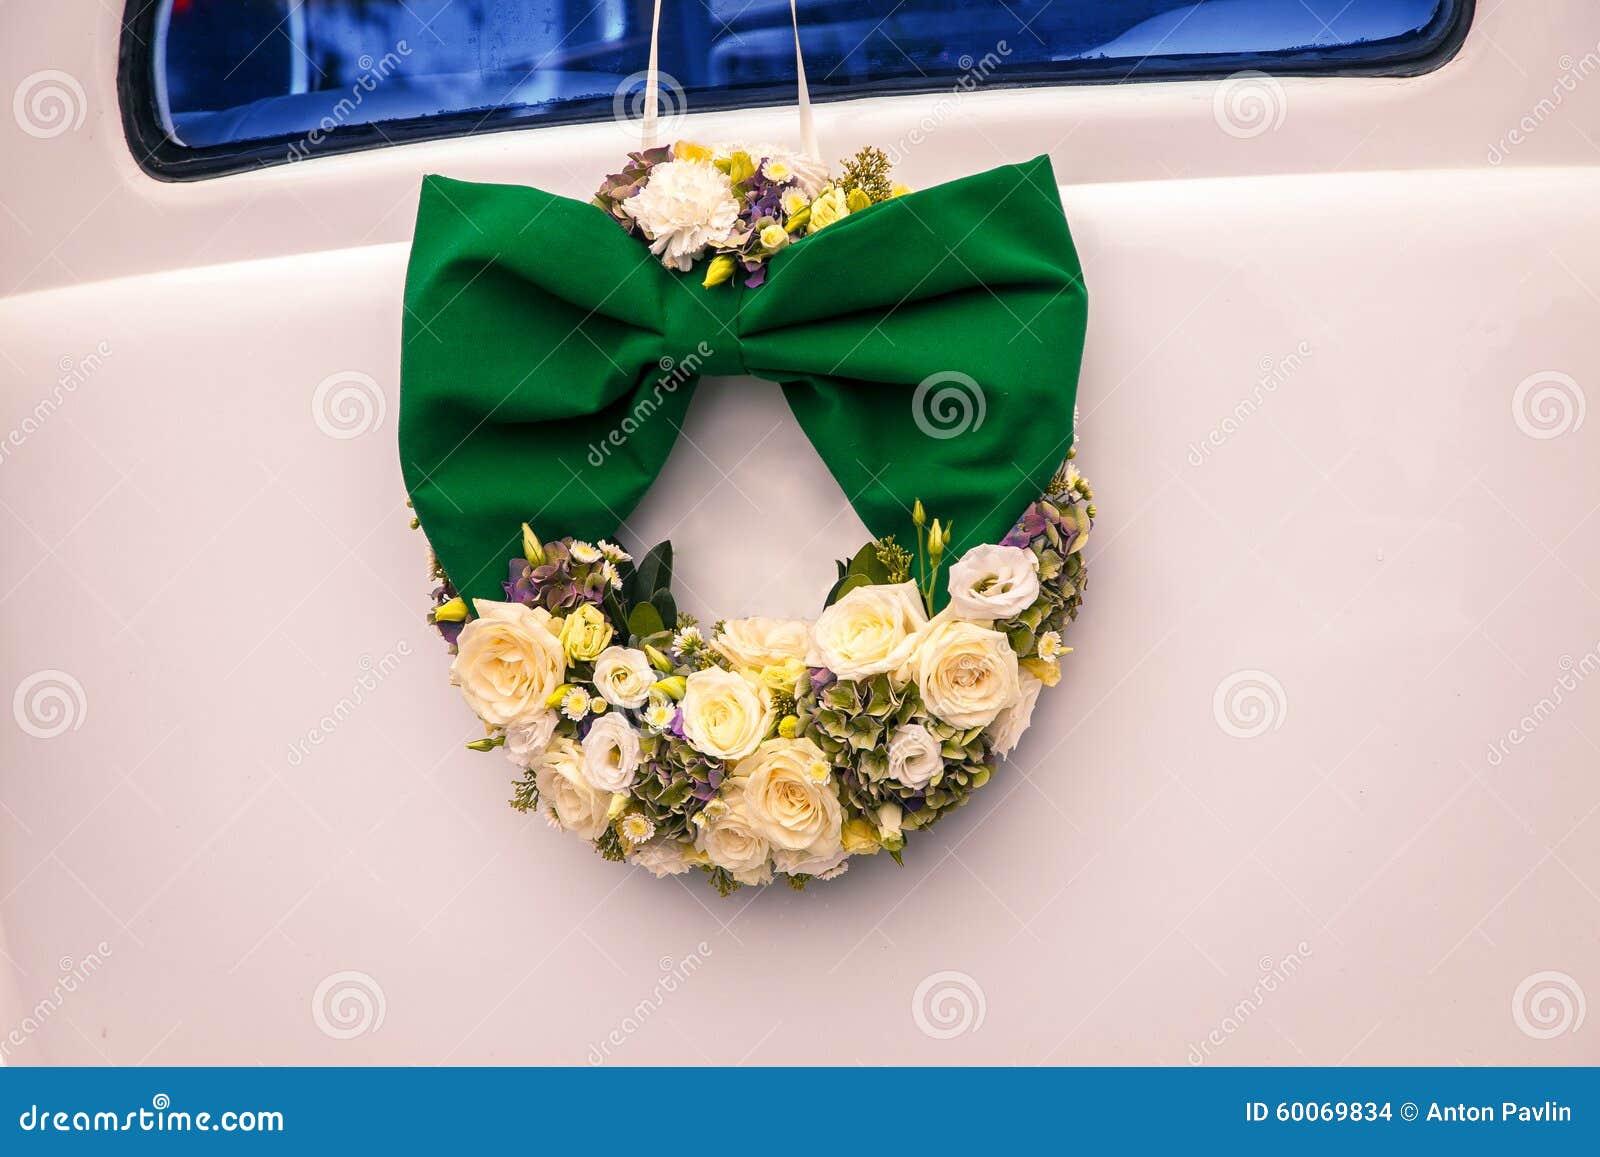 Wedding Bouquet On Vintage Wedding Car Stock Photo 60069834 Megapixl